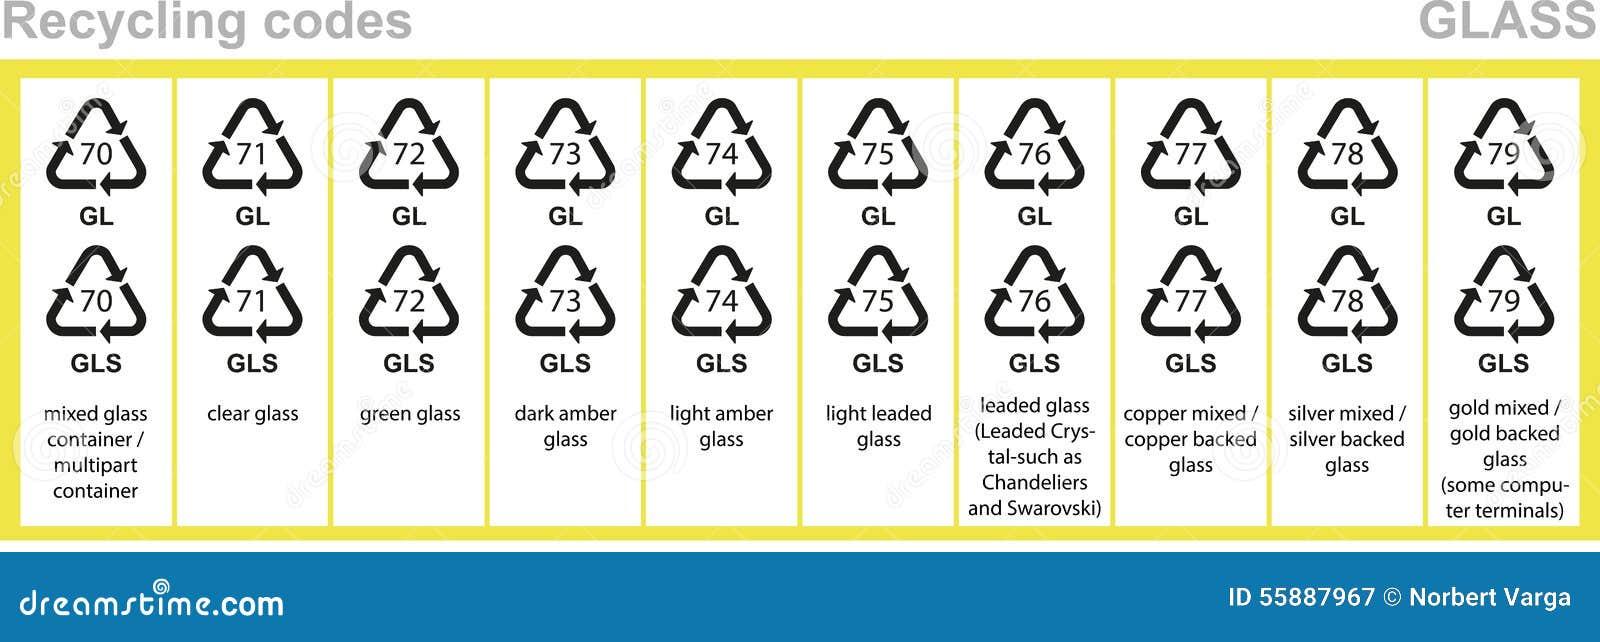 Coupons for recycling / Buca di beppo coupon